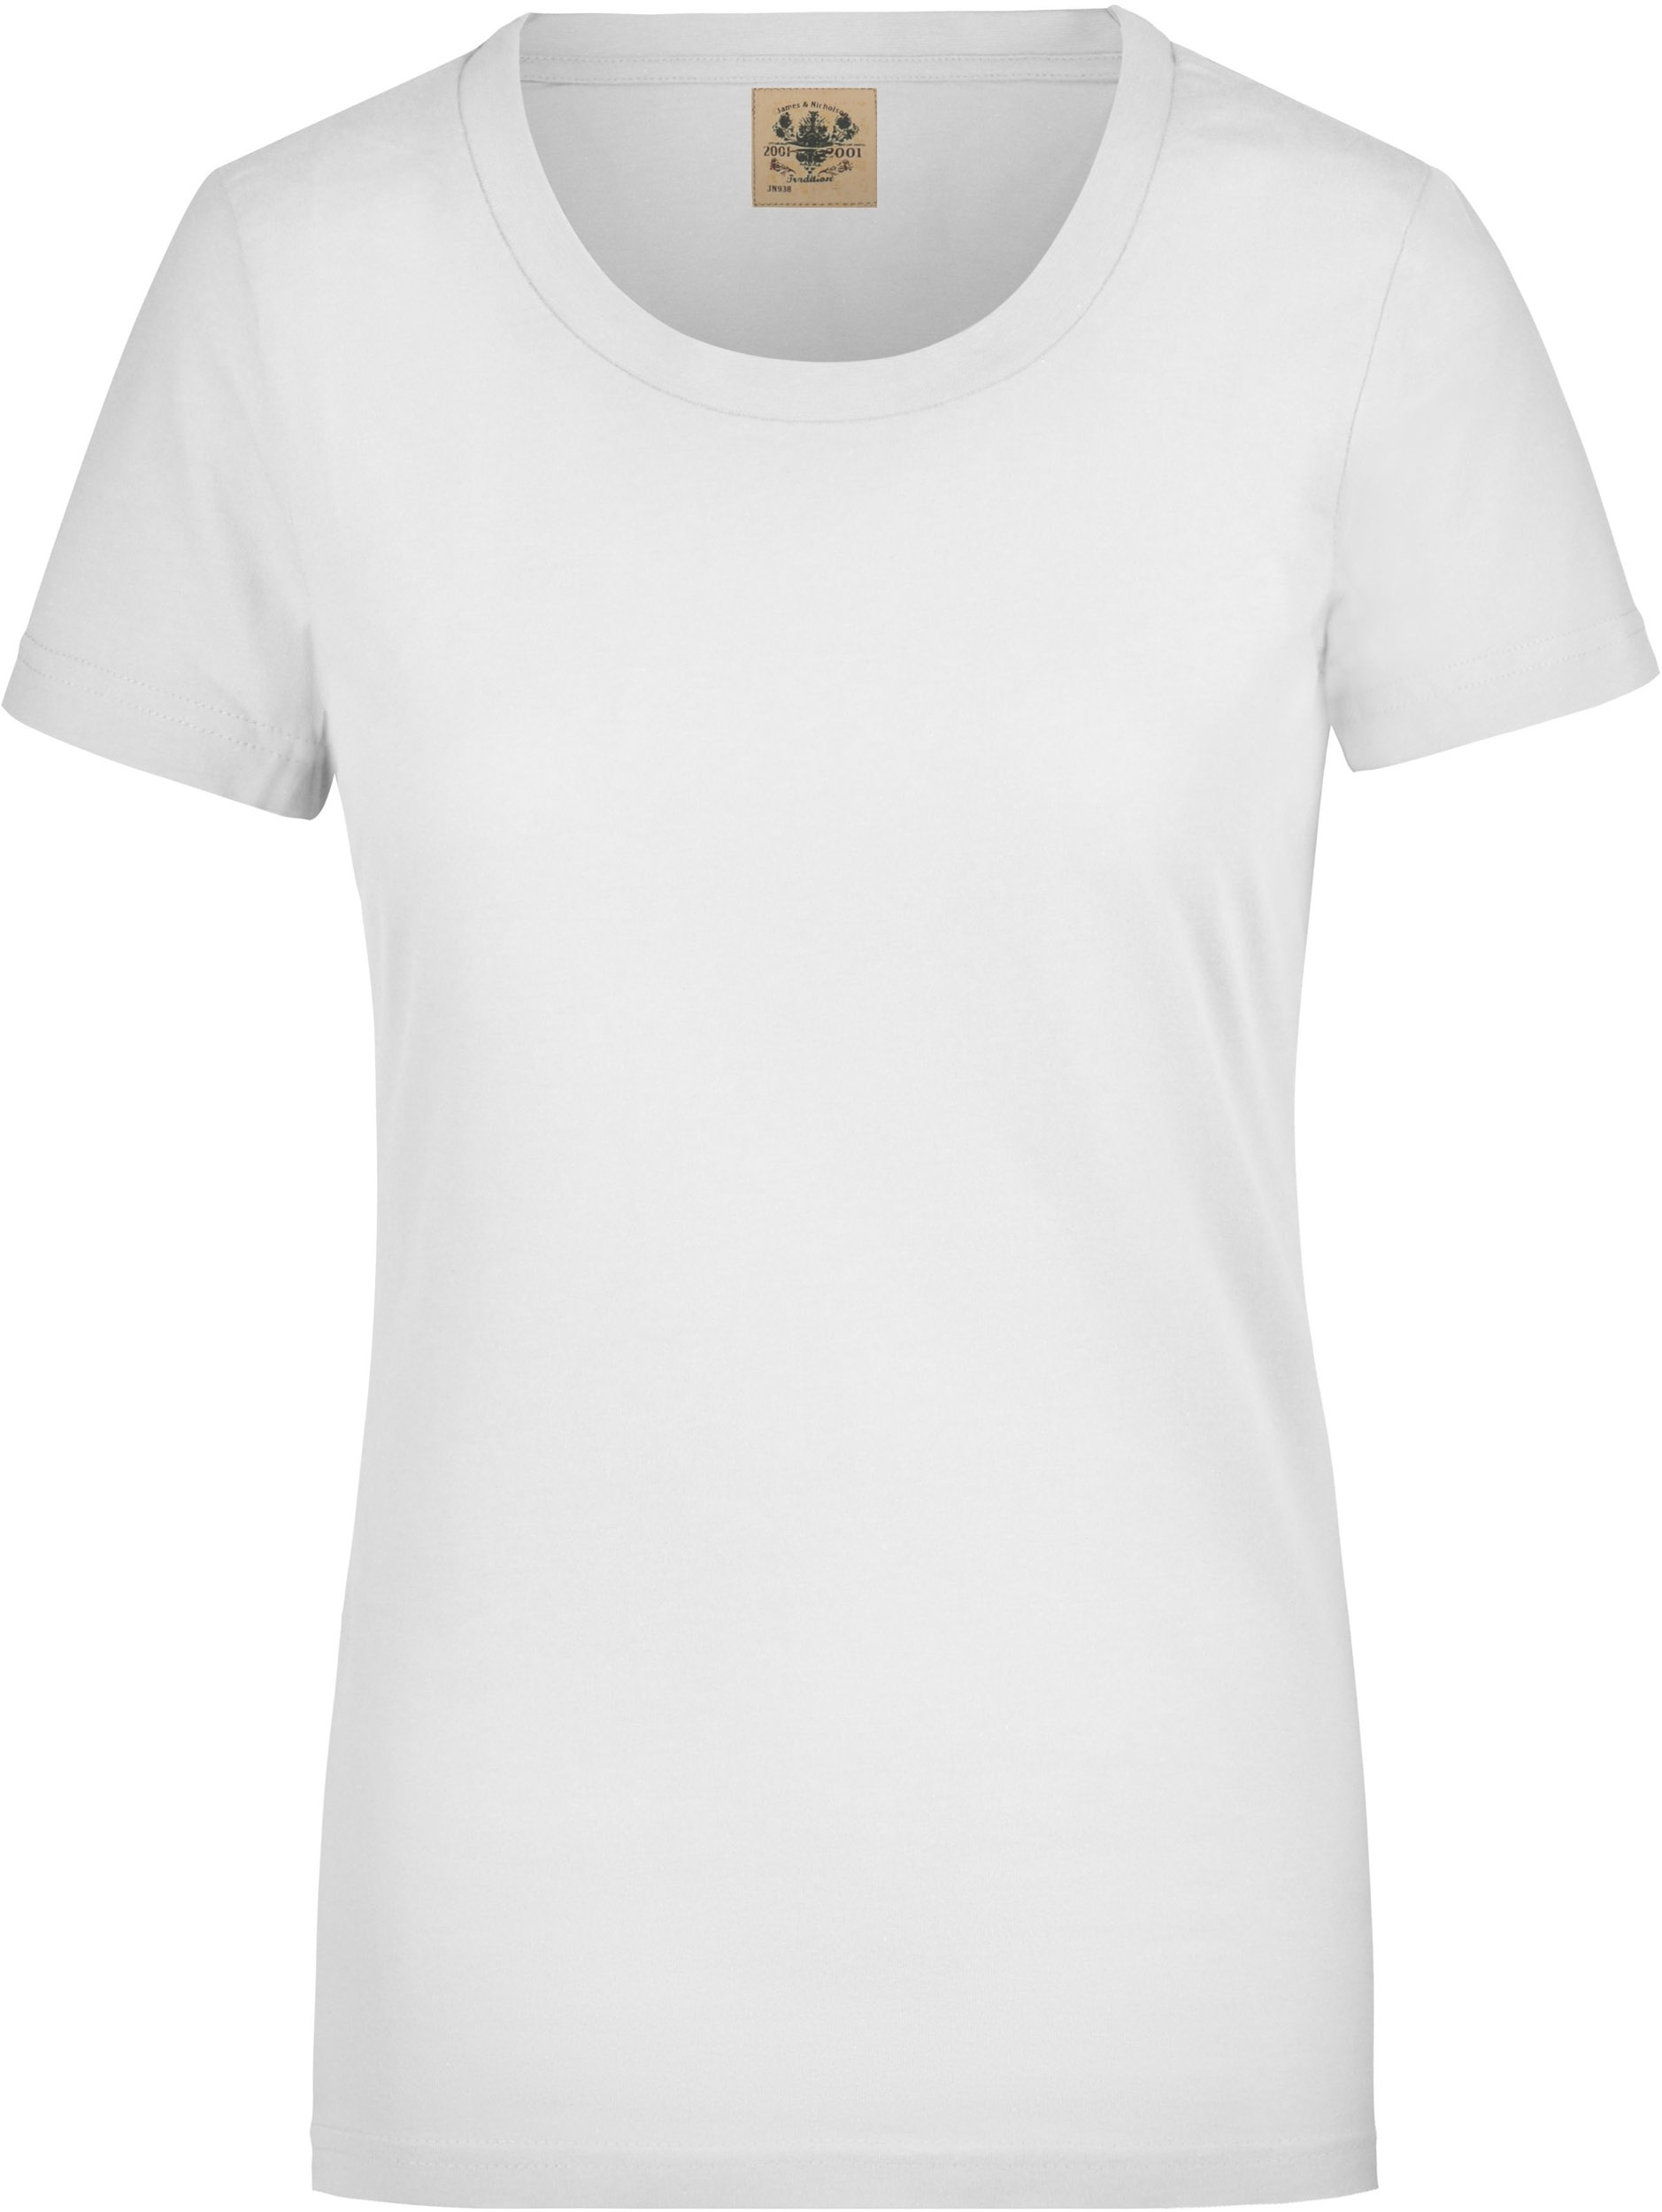 Dámské triko James & Nicholson Vintage Shirt